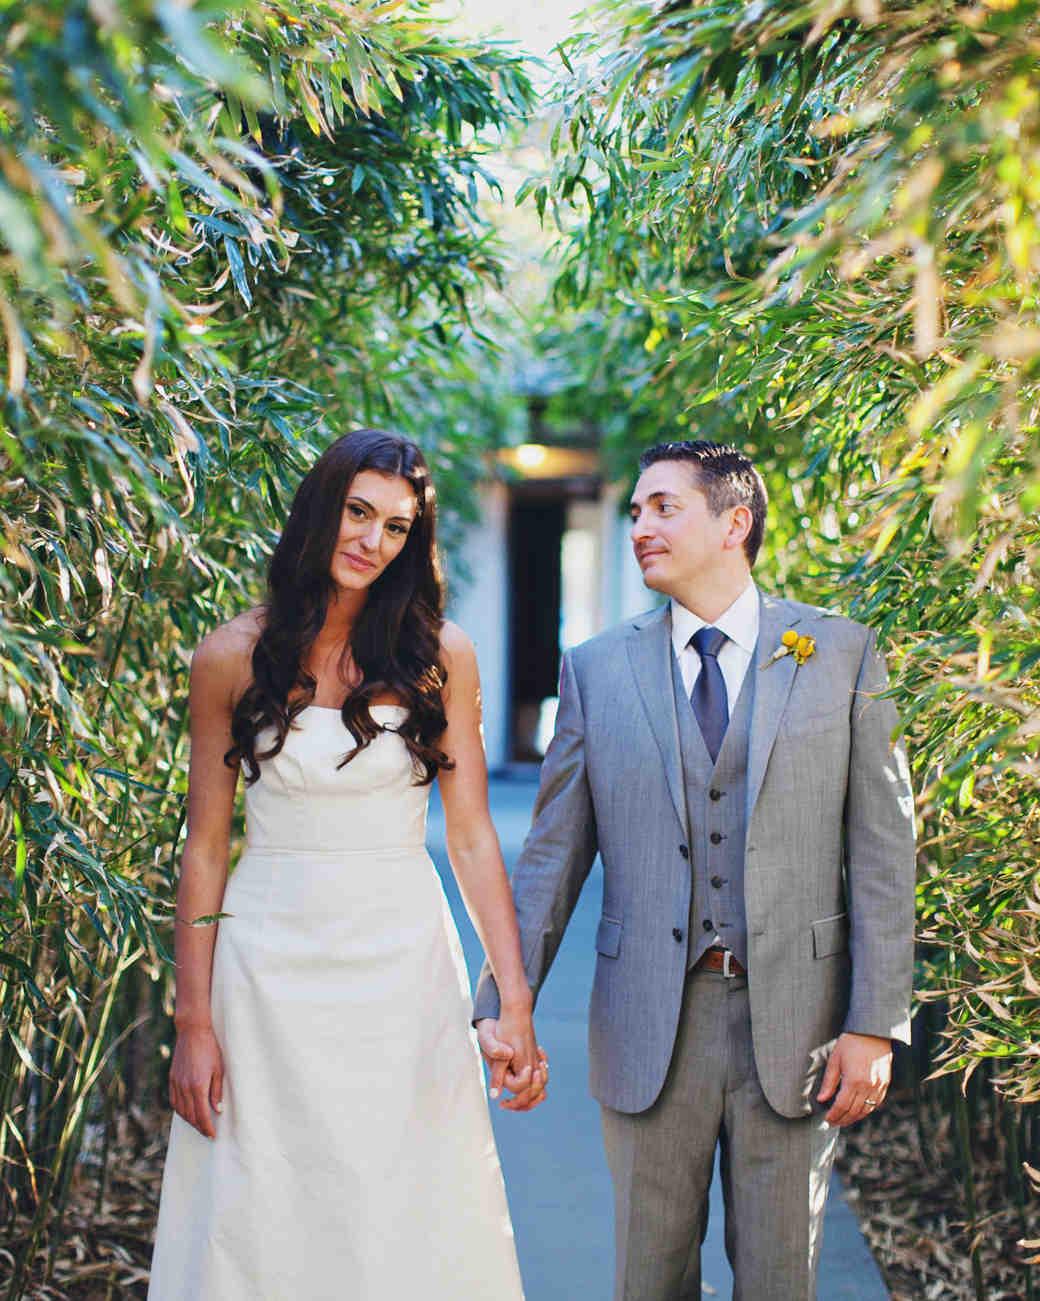 casey-ross-wedding-couple-716-s111514-1114.jpg